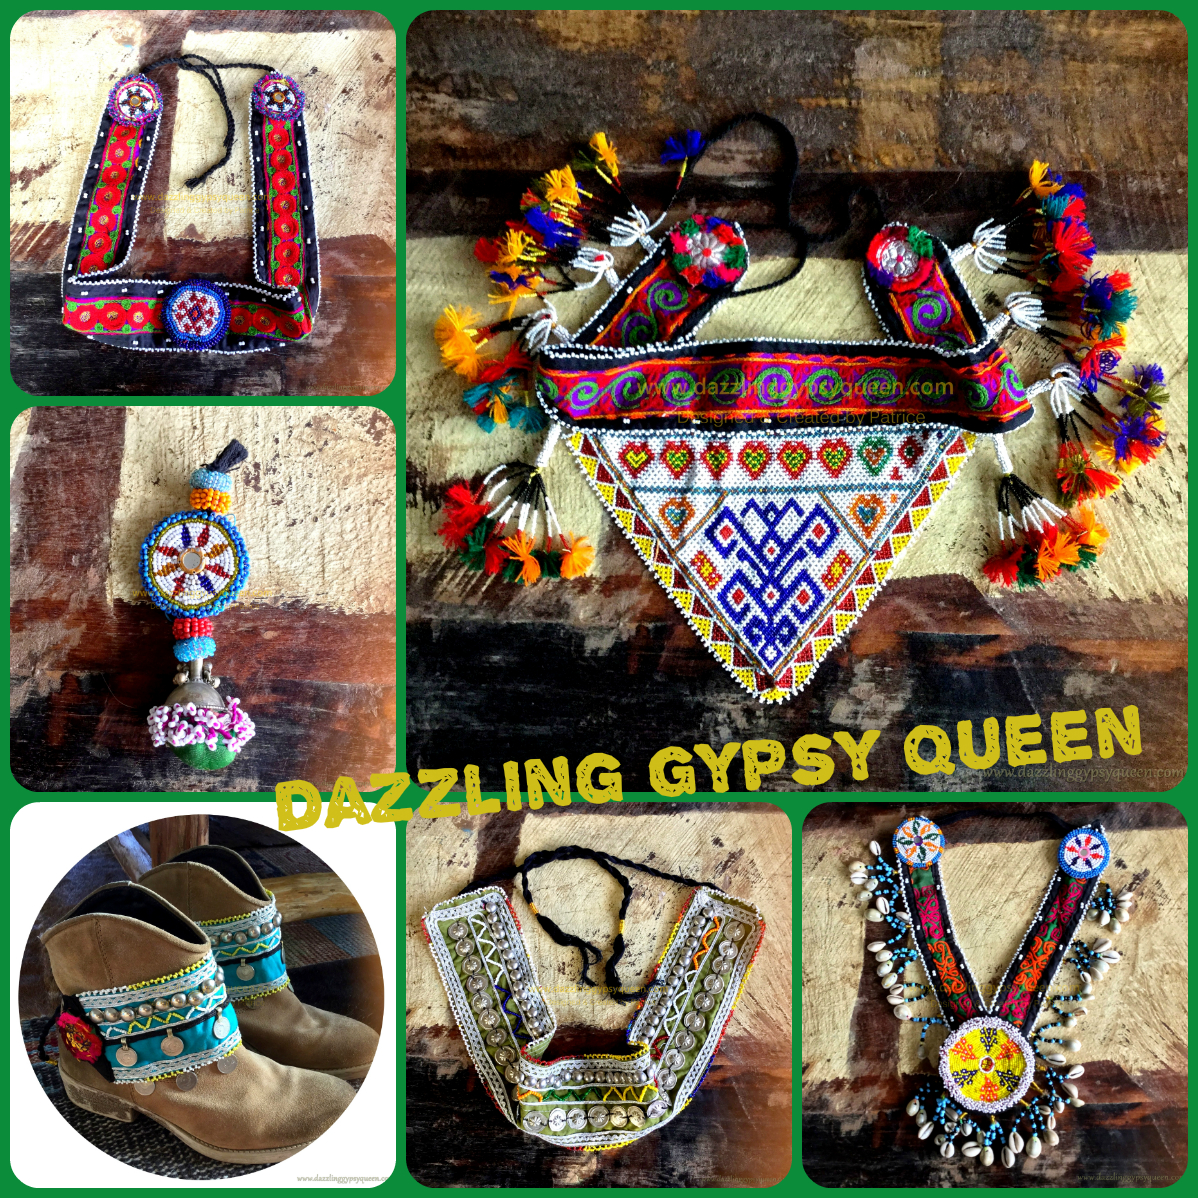 Tribal Kuchi stuff by Dazzling Gypsy Queen